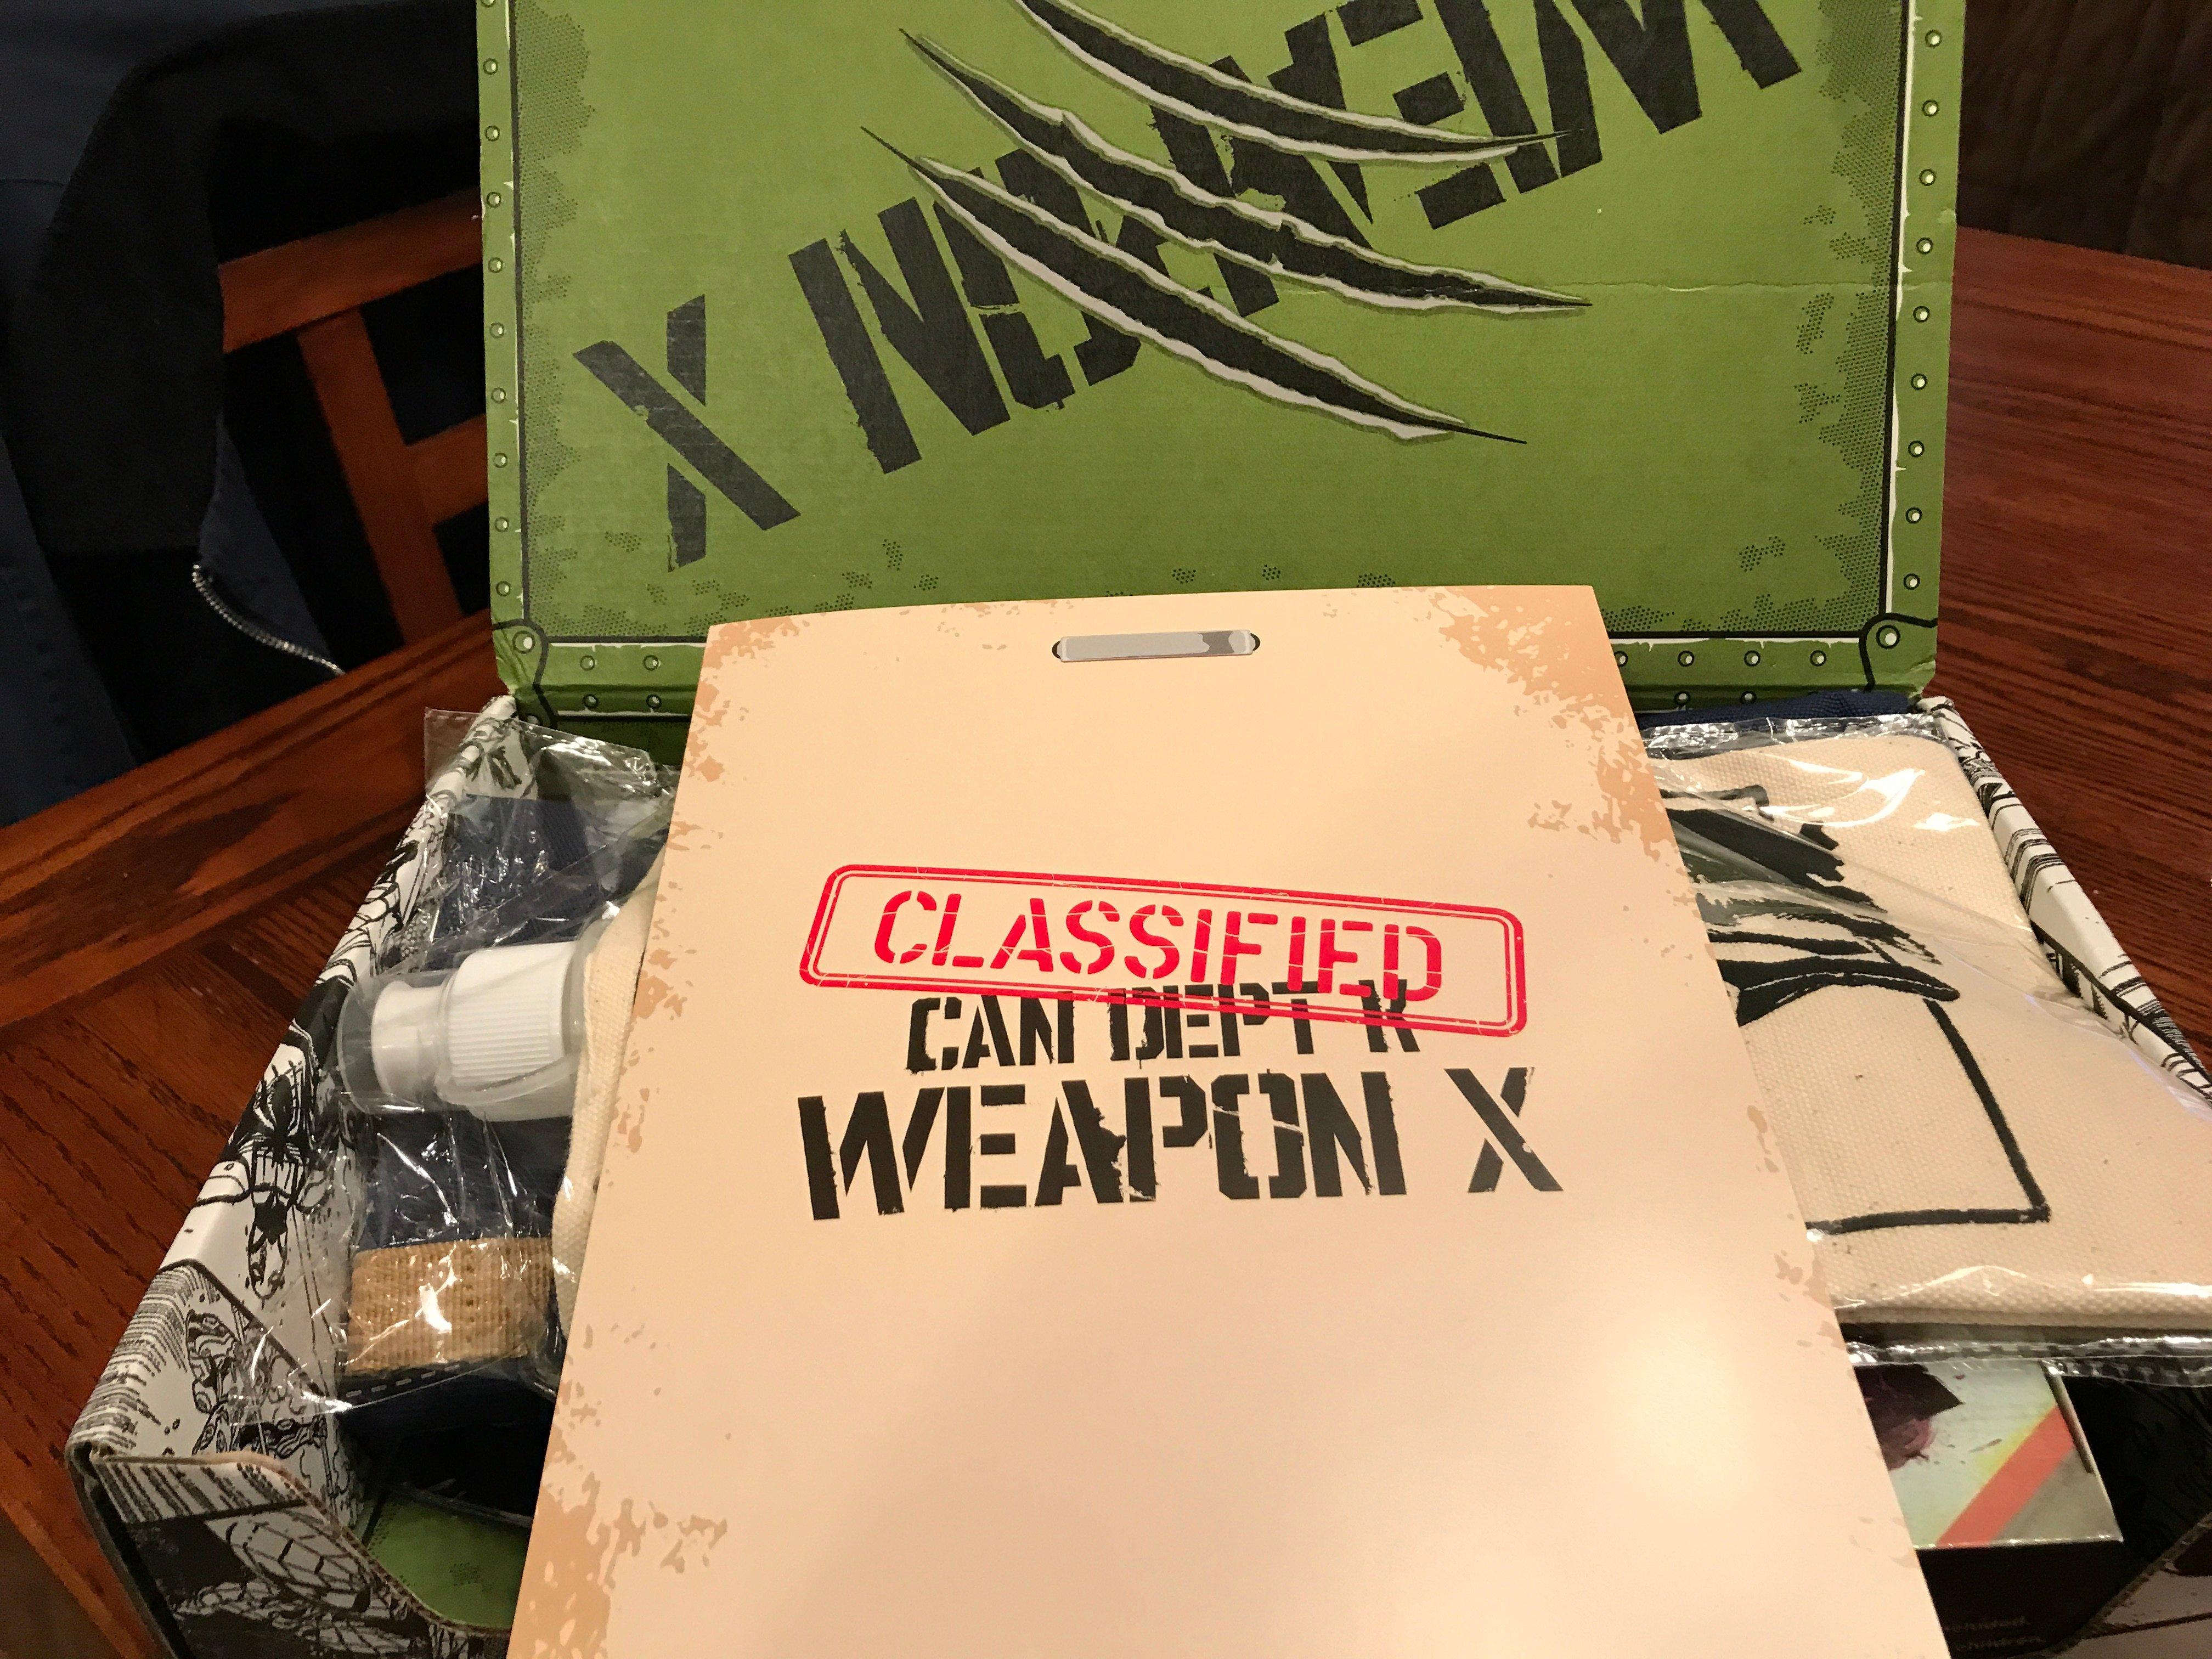 Marvel Gear + Goods Weapon X